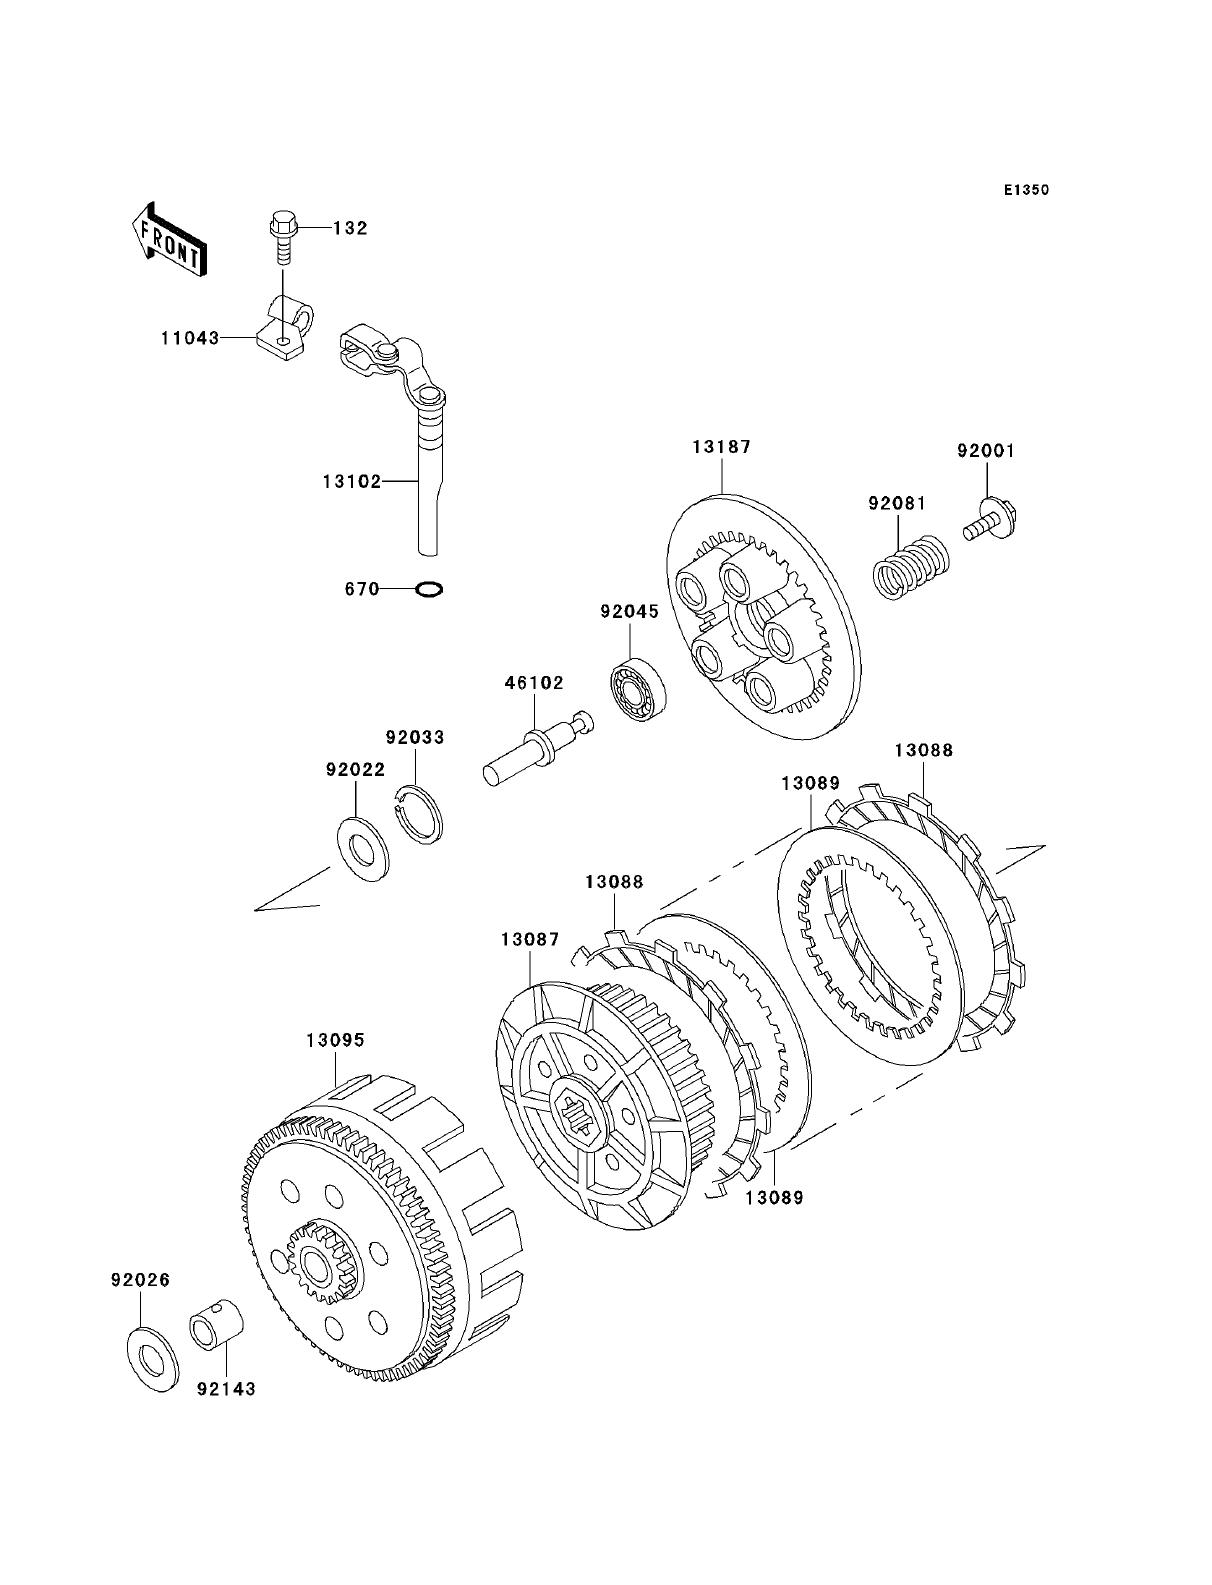 klr 250 1986 wiring diagram